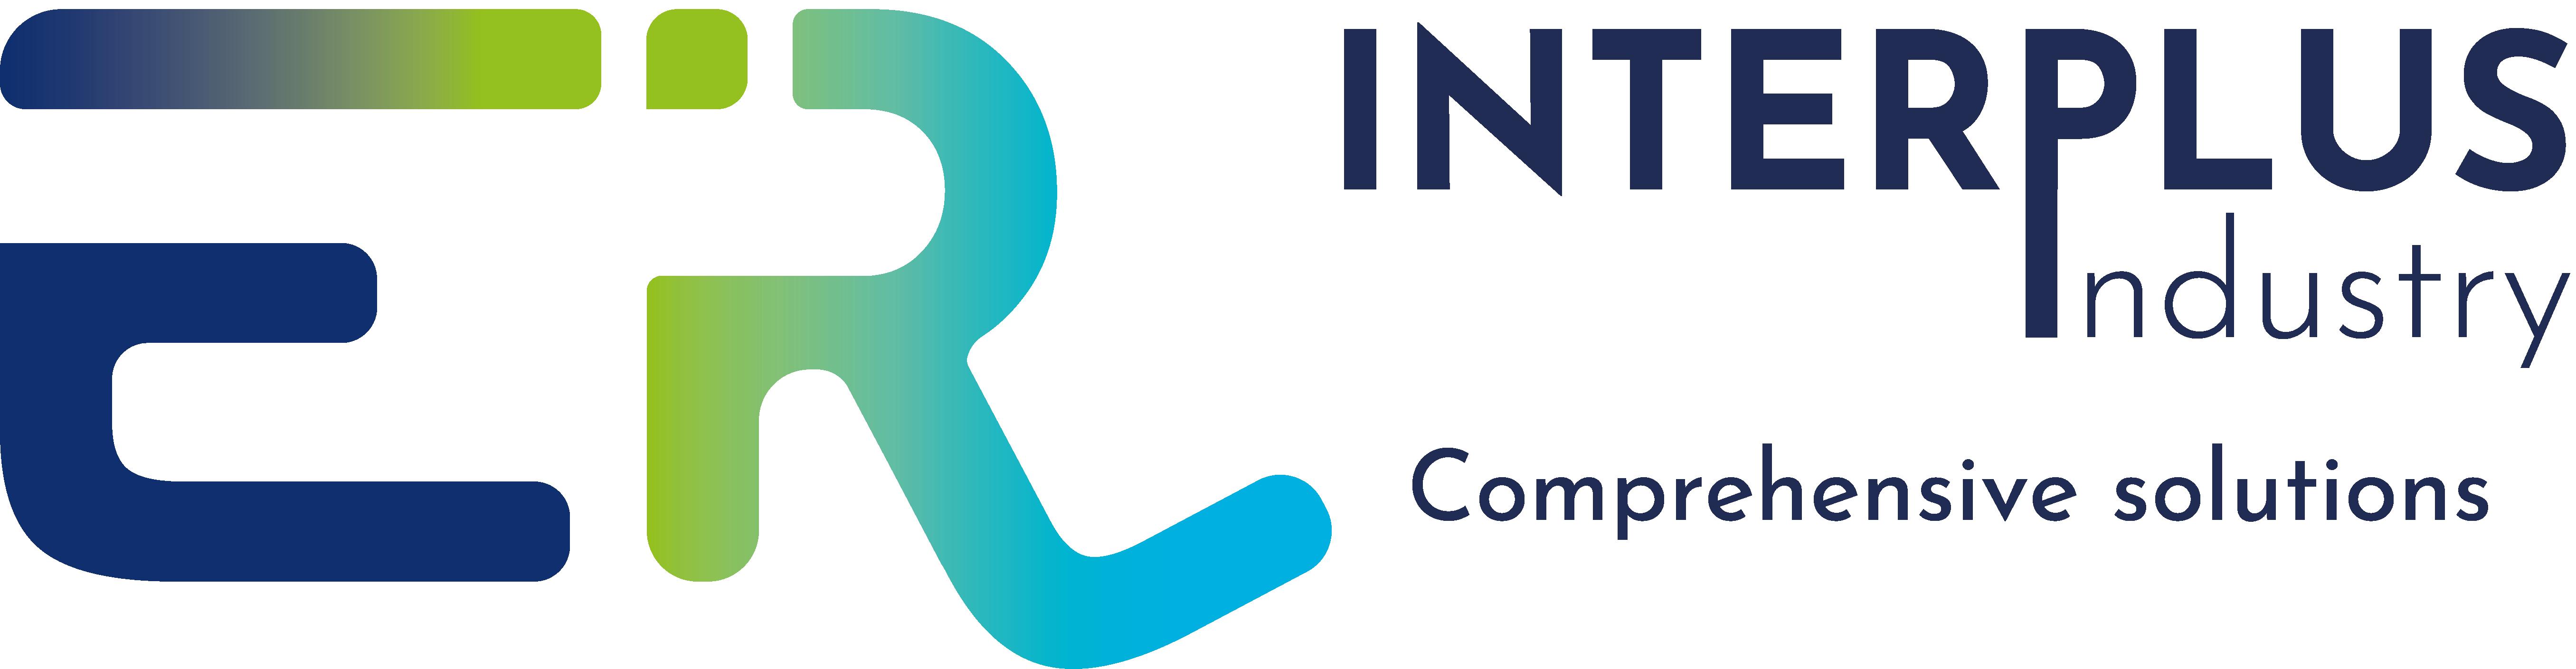 Logo ER interplus industry comprehensive solutions